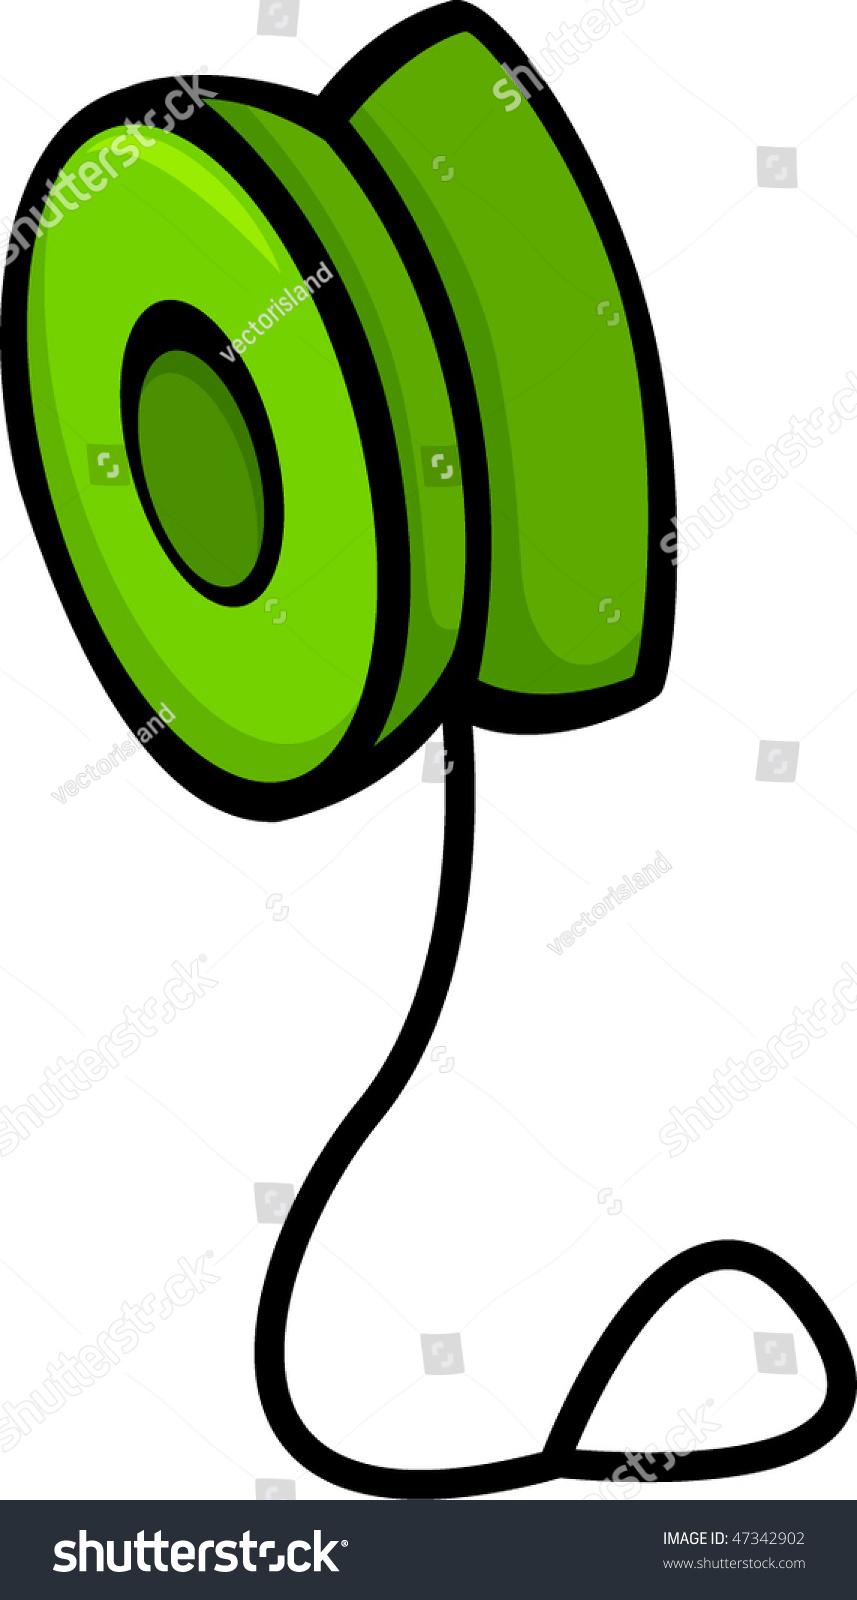 transparent Yoyo clipart green. Yo free download best